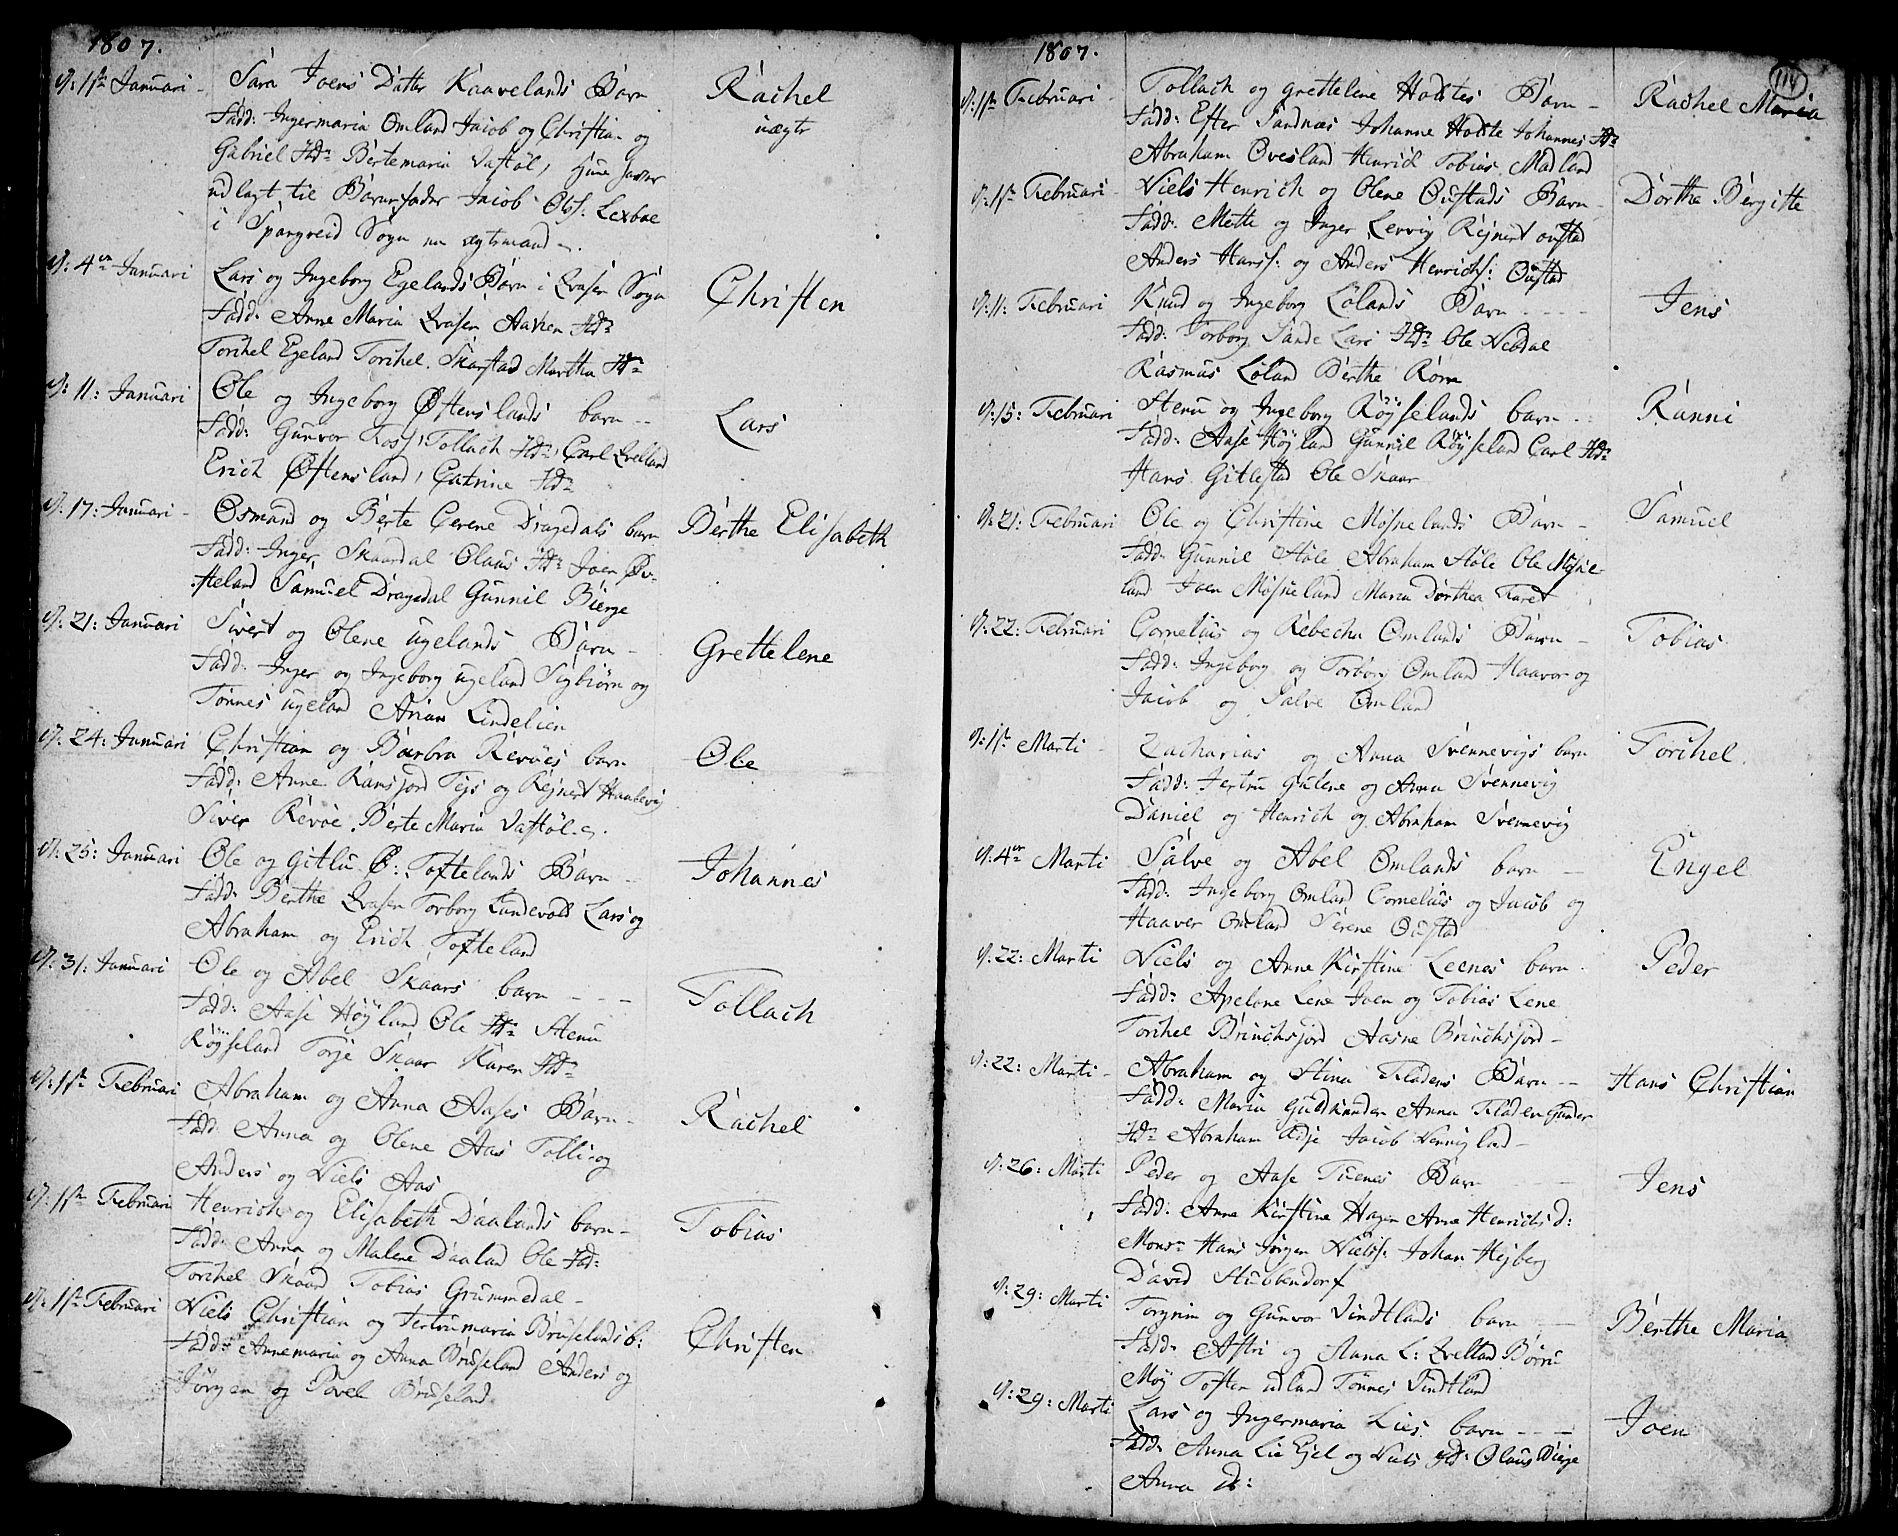 SAK, Lyngdal sokneprestkontor, F/Fa/Fac/L0004: Ministerialbok nr. A 4, 1780-1815, s. 114